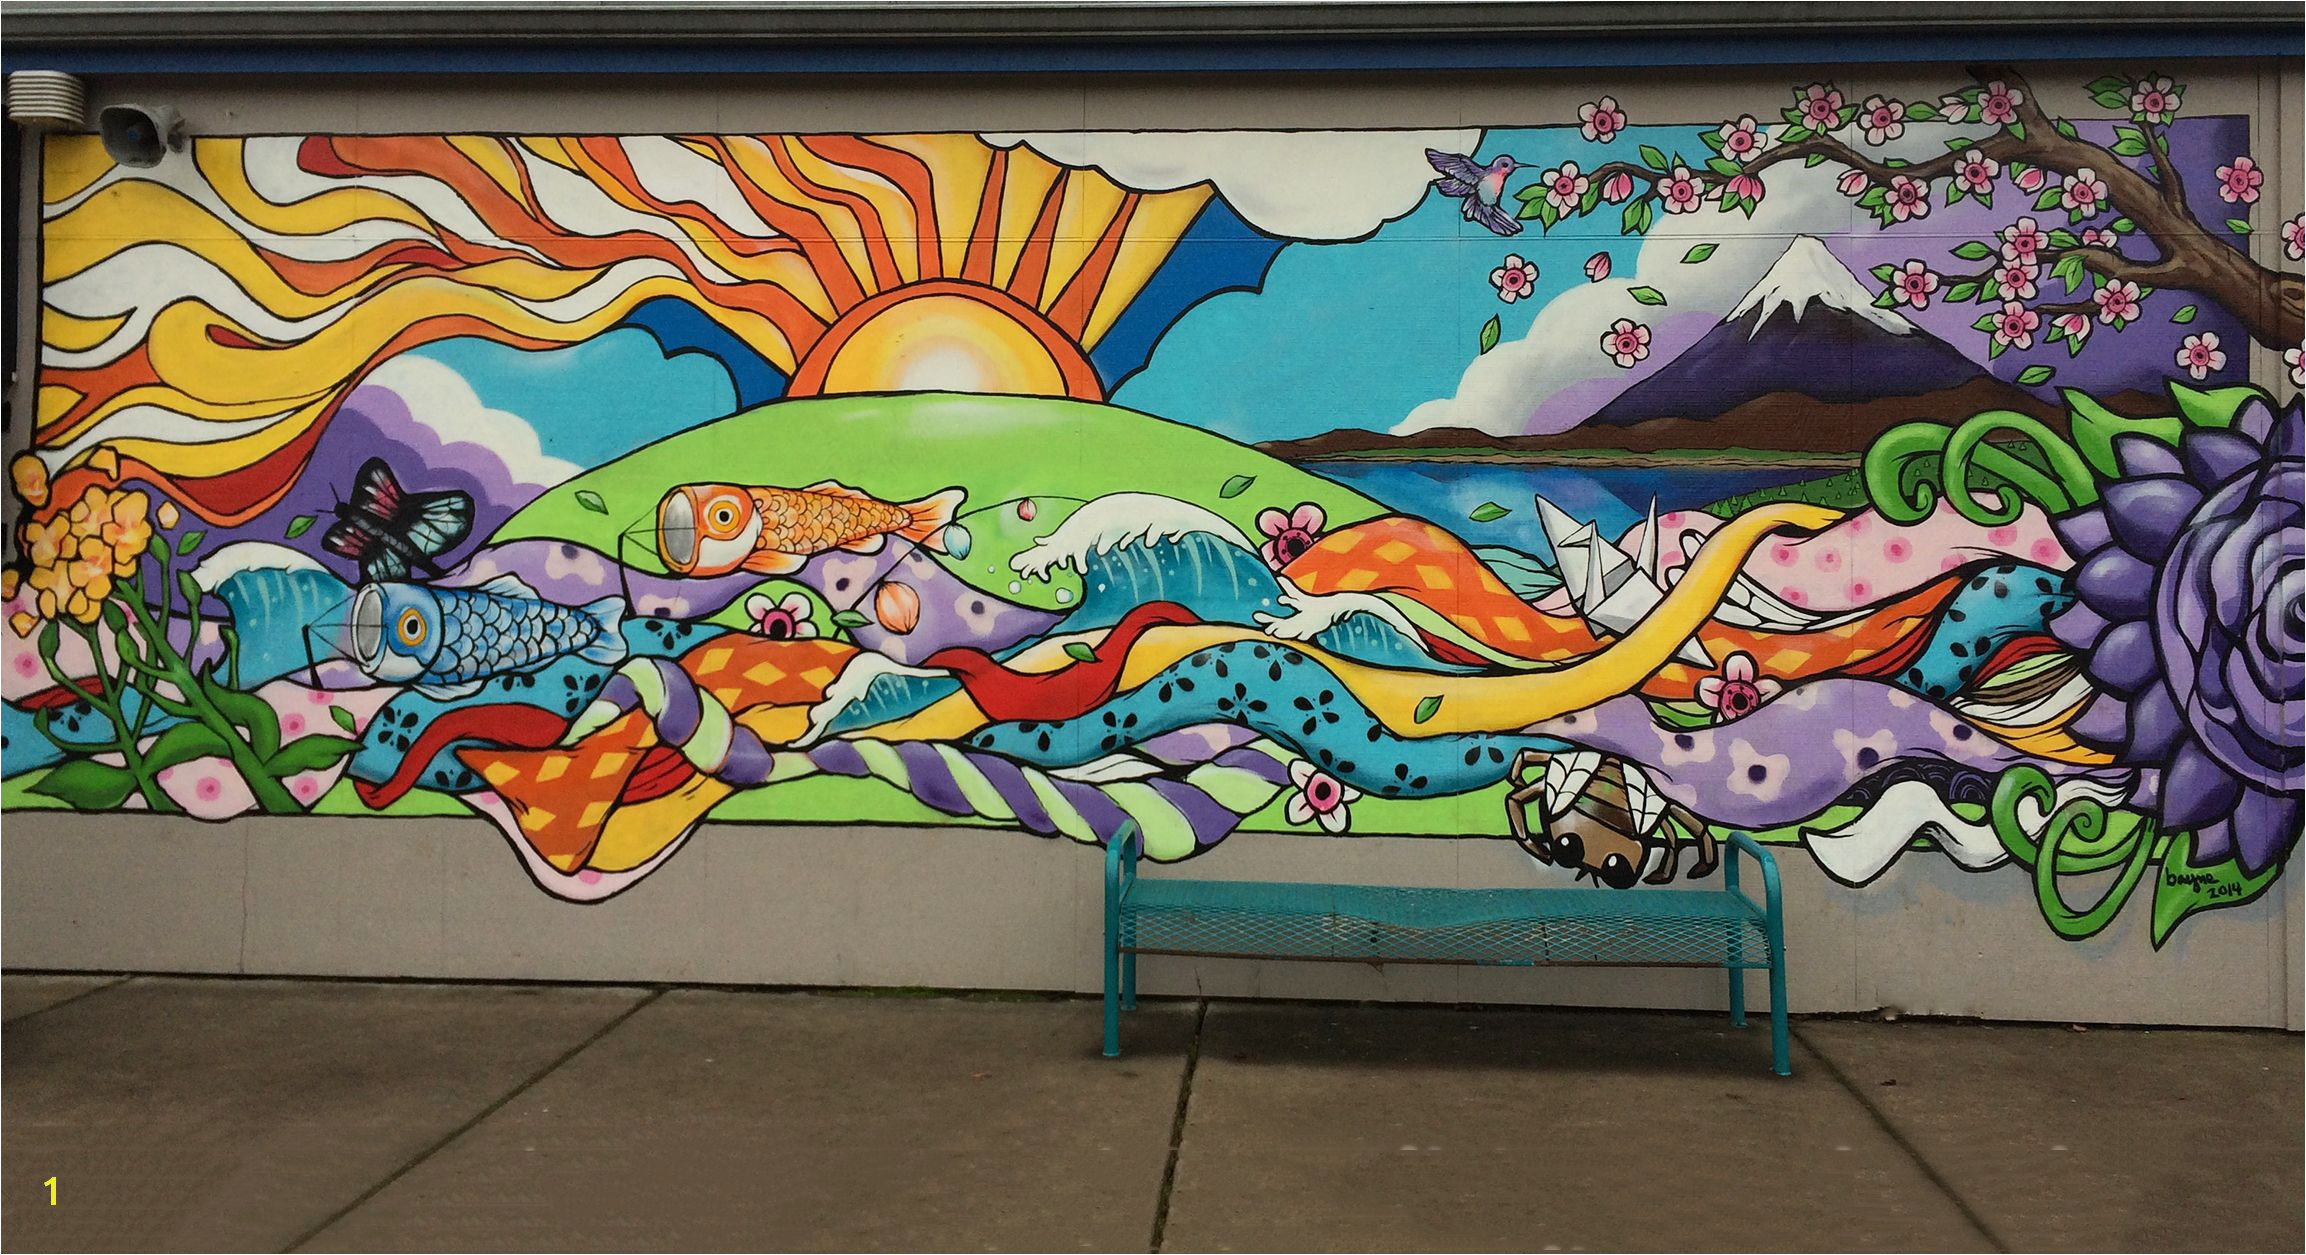 Outdoor Wall Mural Stencils Elementary School Mural Google Search